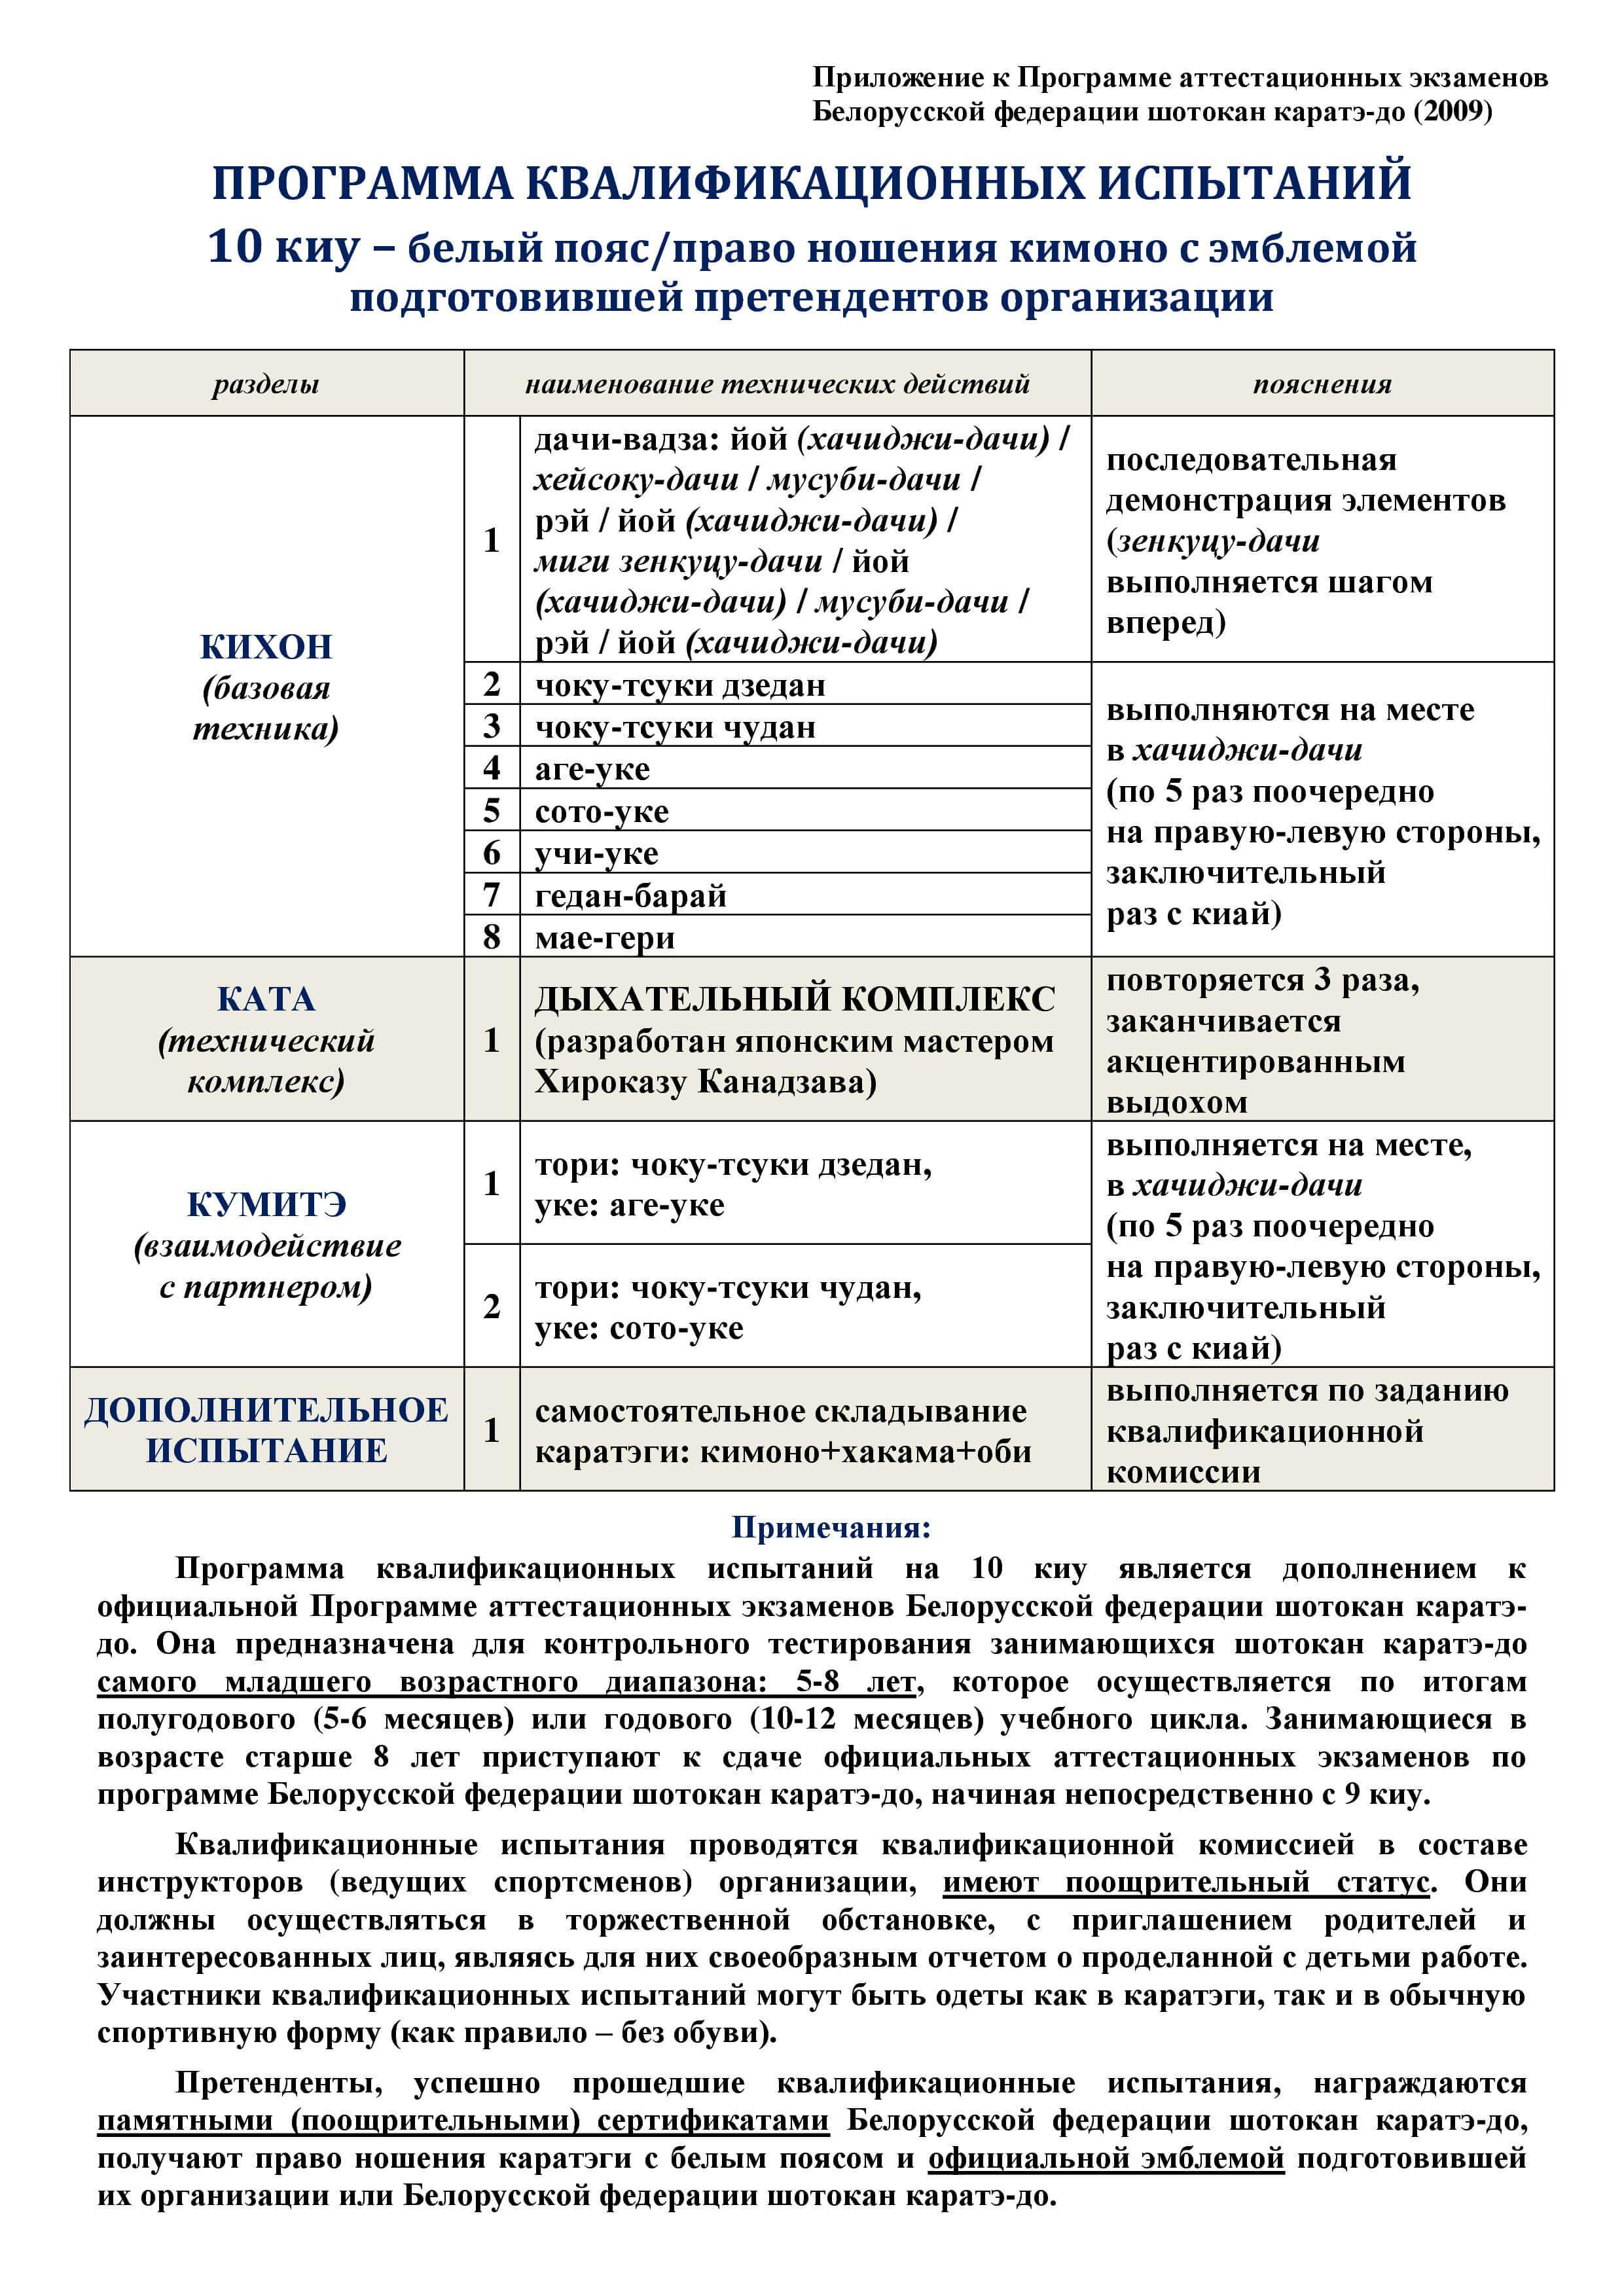 10 киу Программа испытаний (2009)